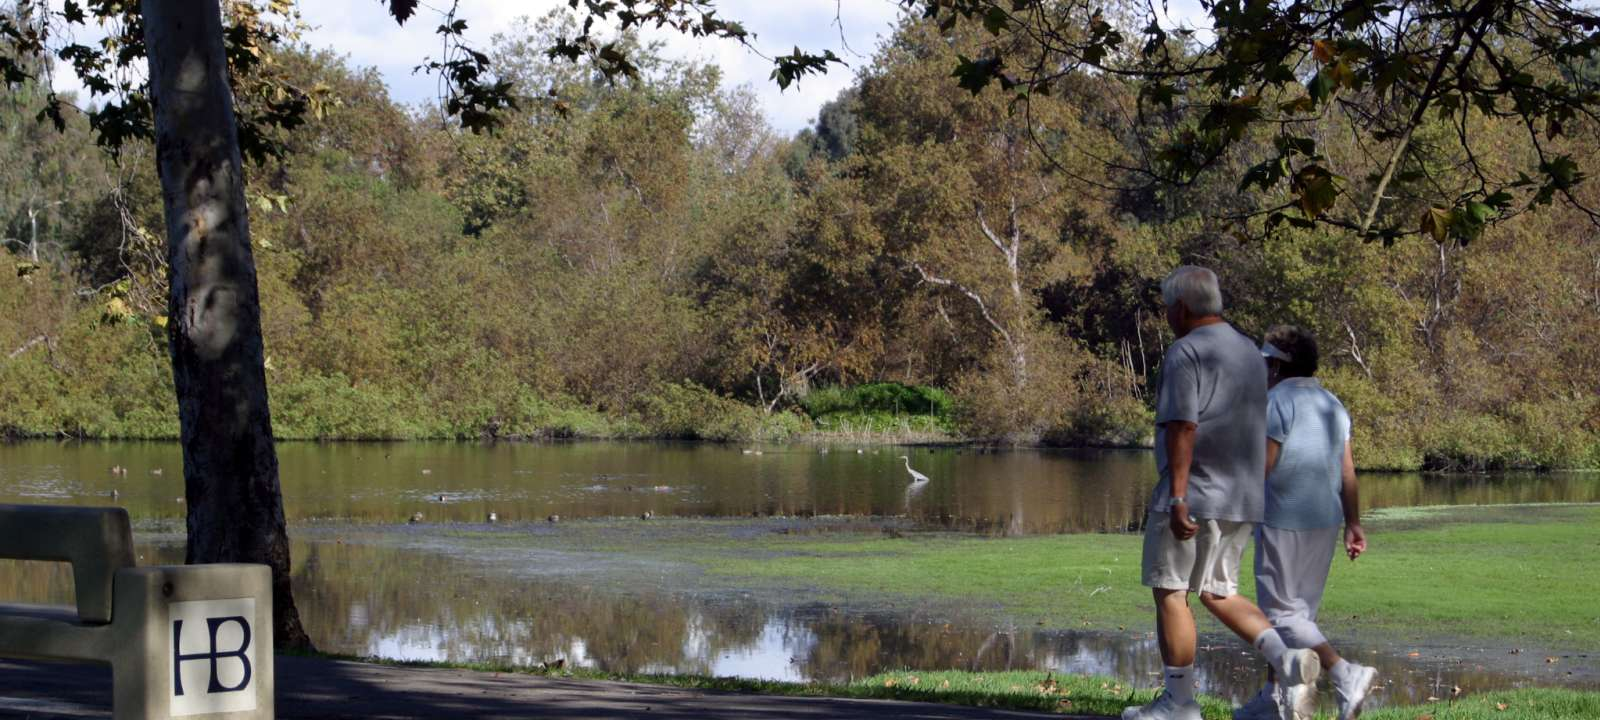 Huntington Central Park | Shipley Nature Center | Disc Golf Course